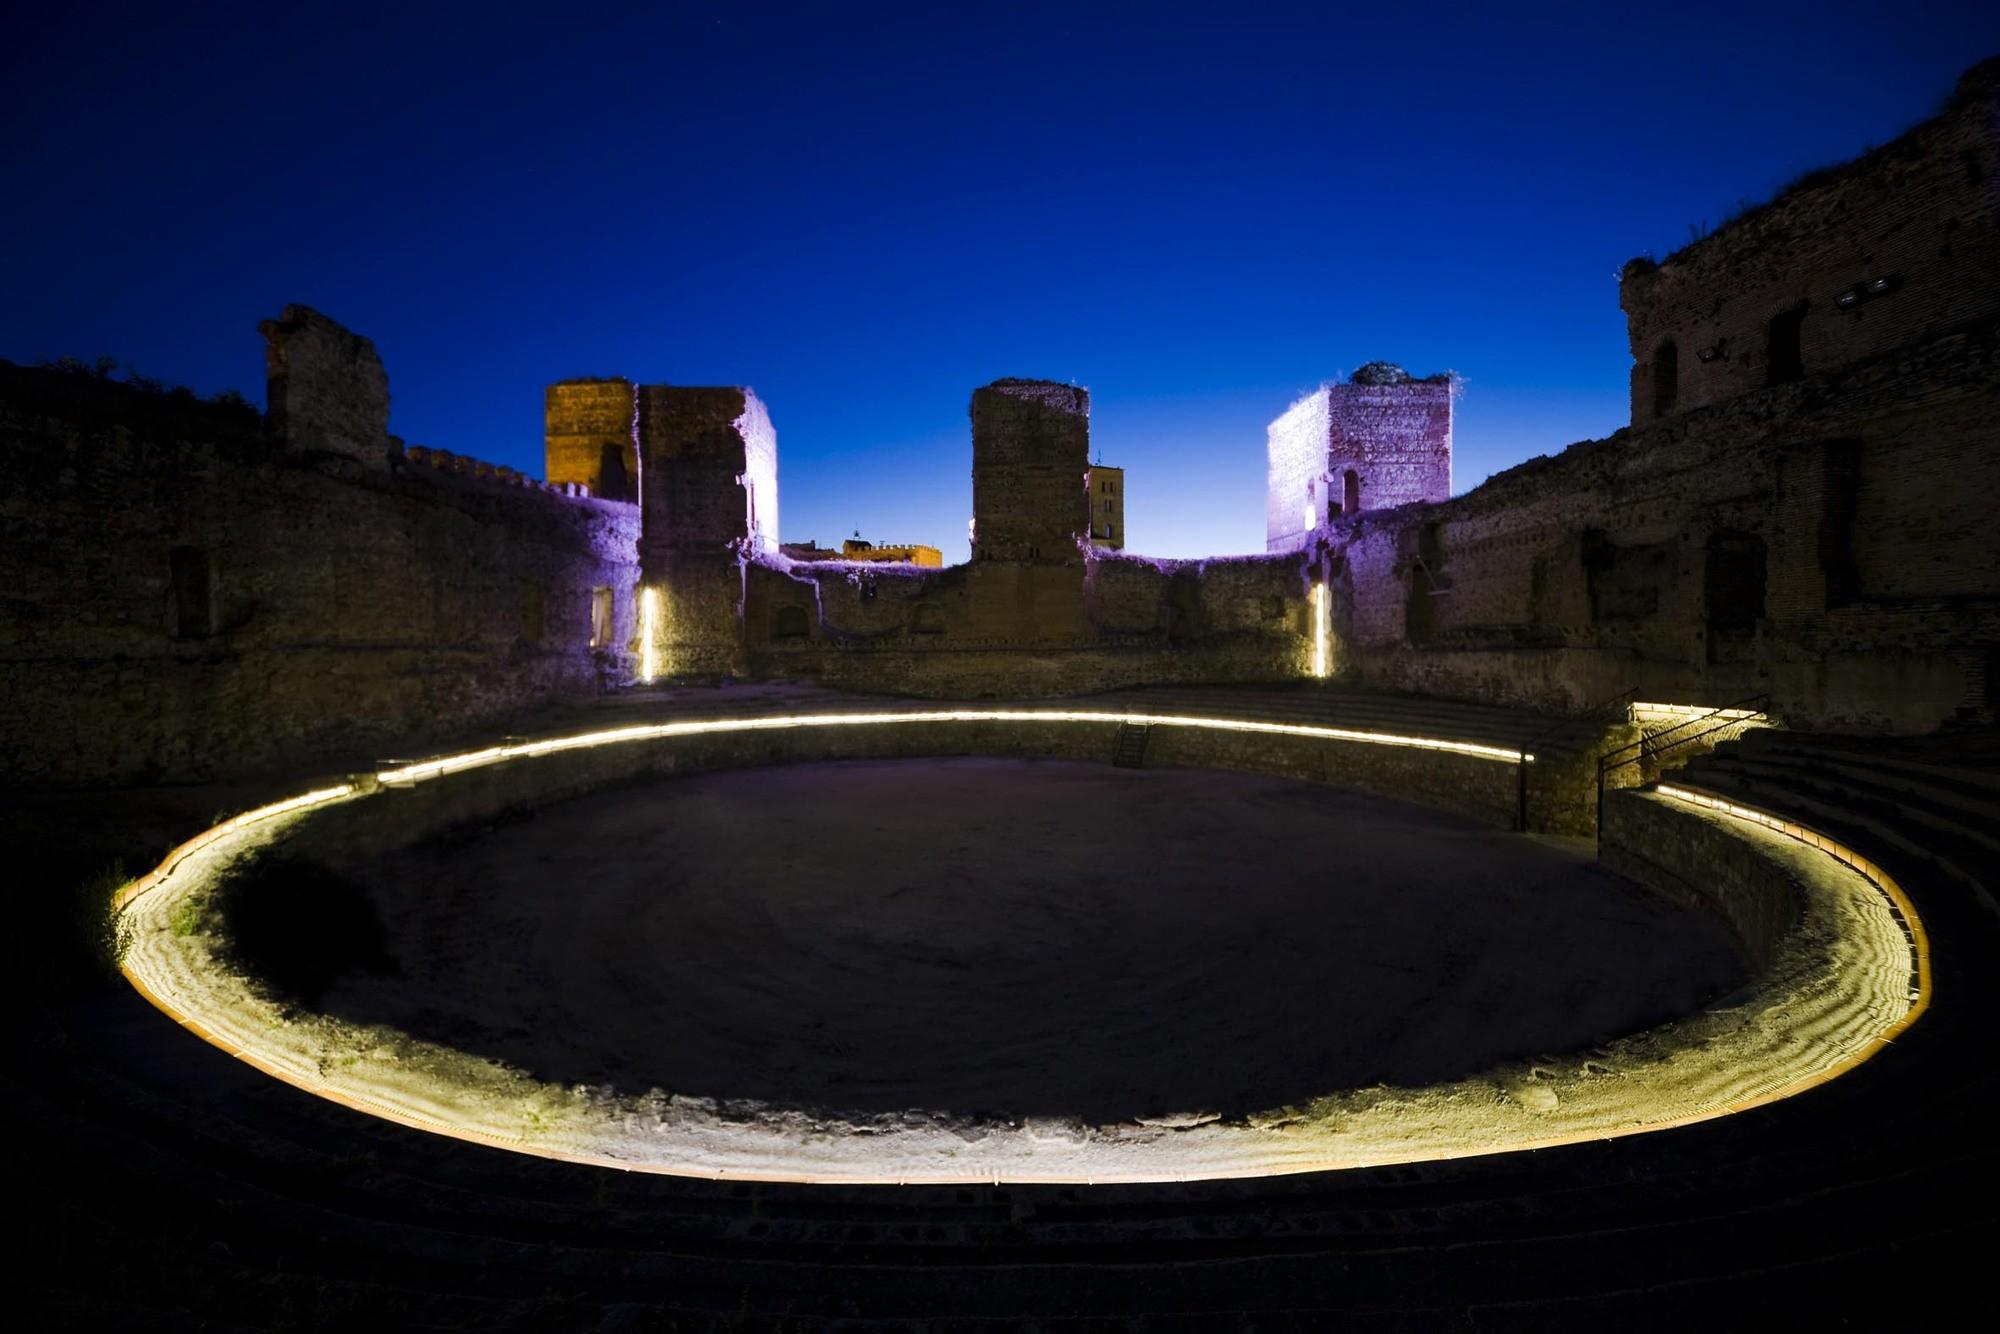 Galeria de ilumina o do castelo buitrago del lozoya - Muka arquitectura ...